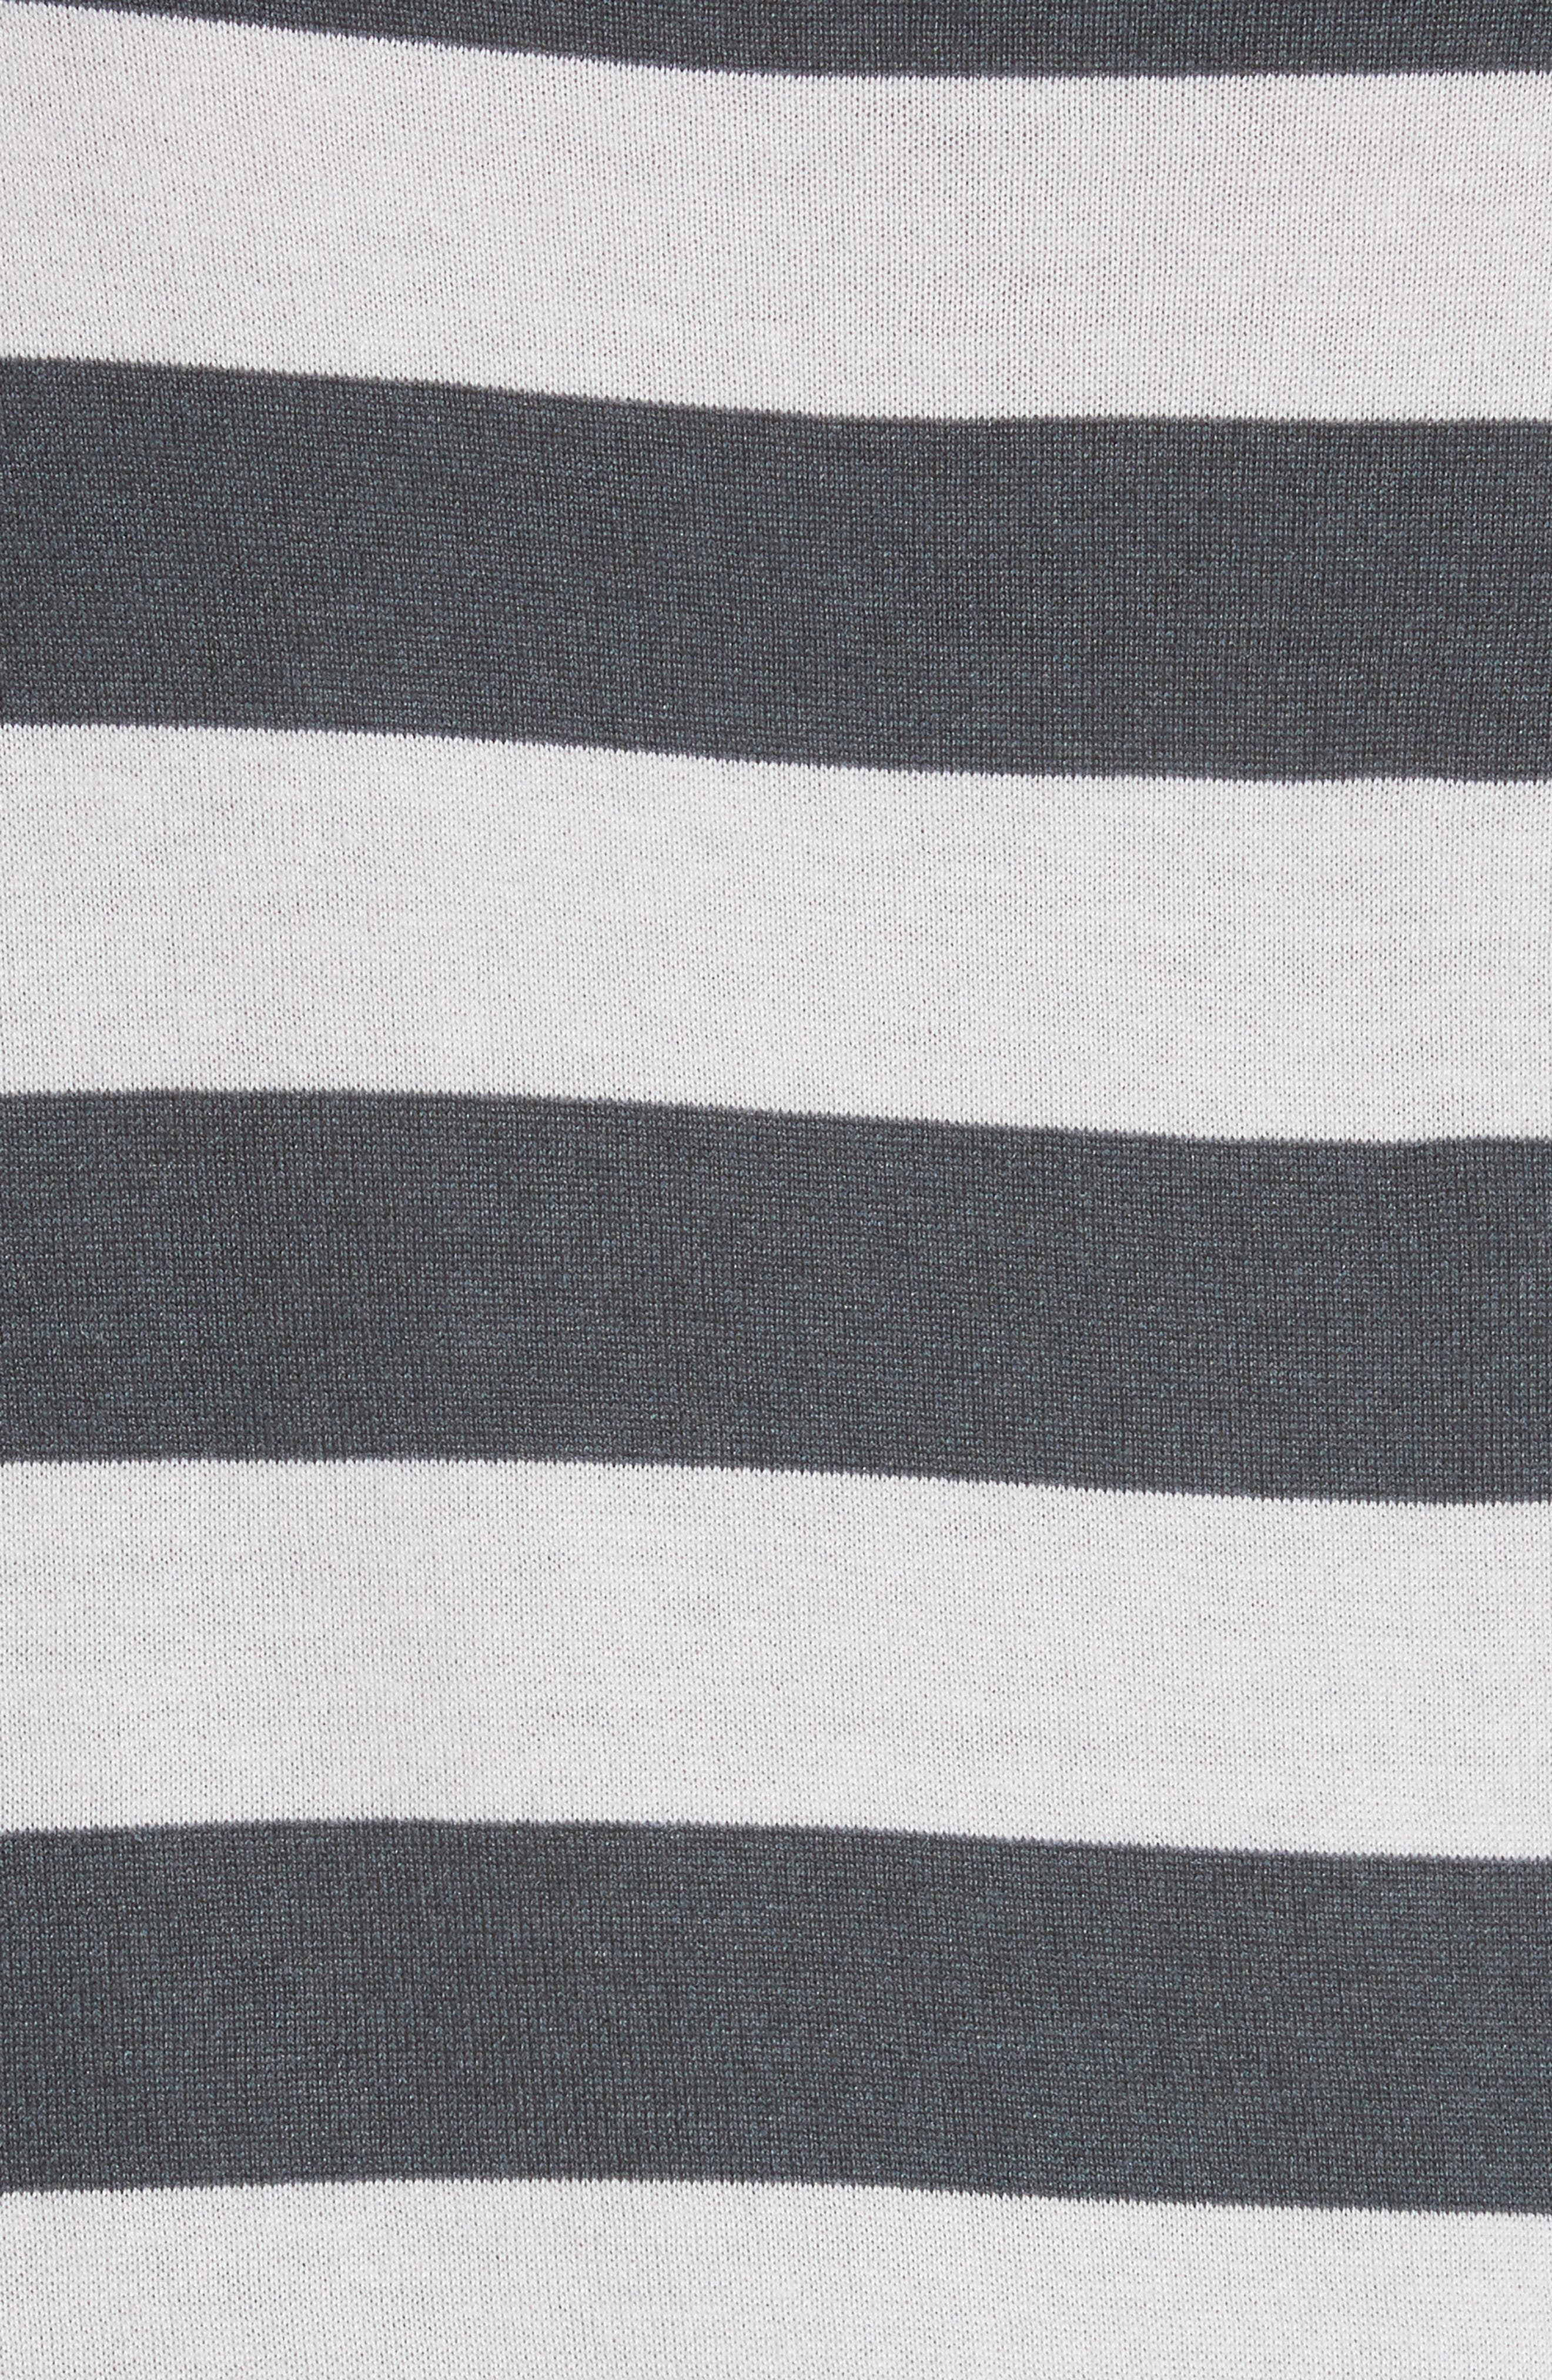 Marica Stripe Silk & Cashmere Sweater,                             Alternate thumbnail 5, color,                             054